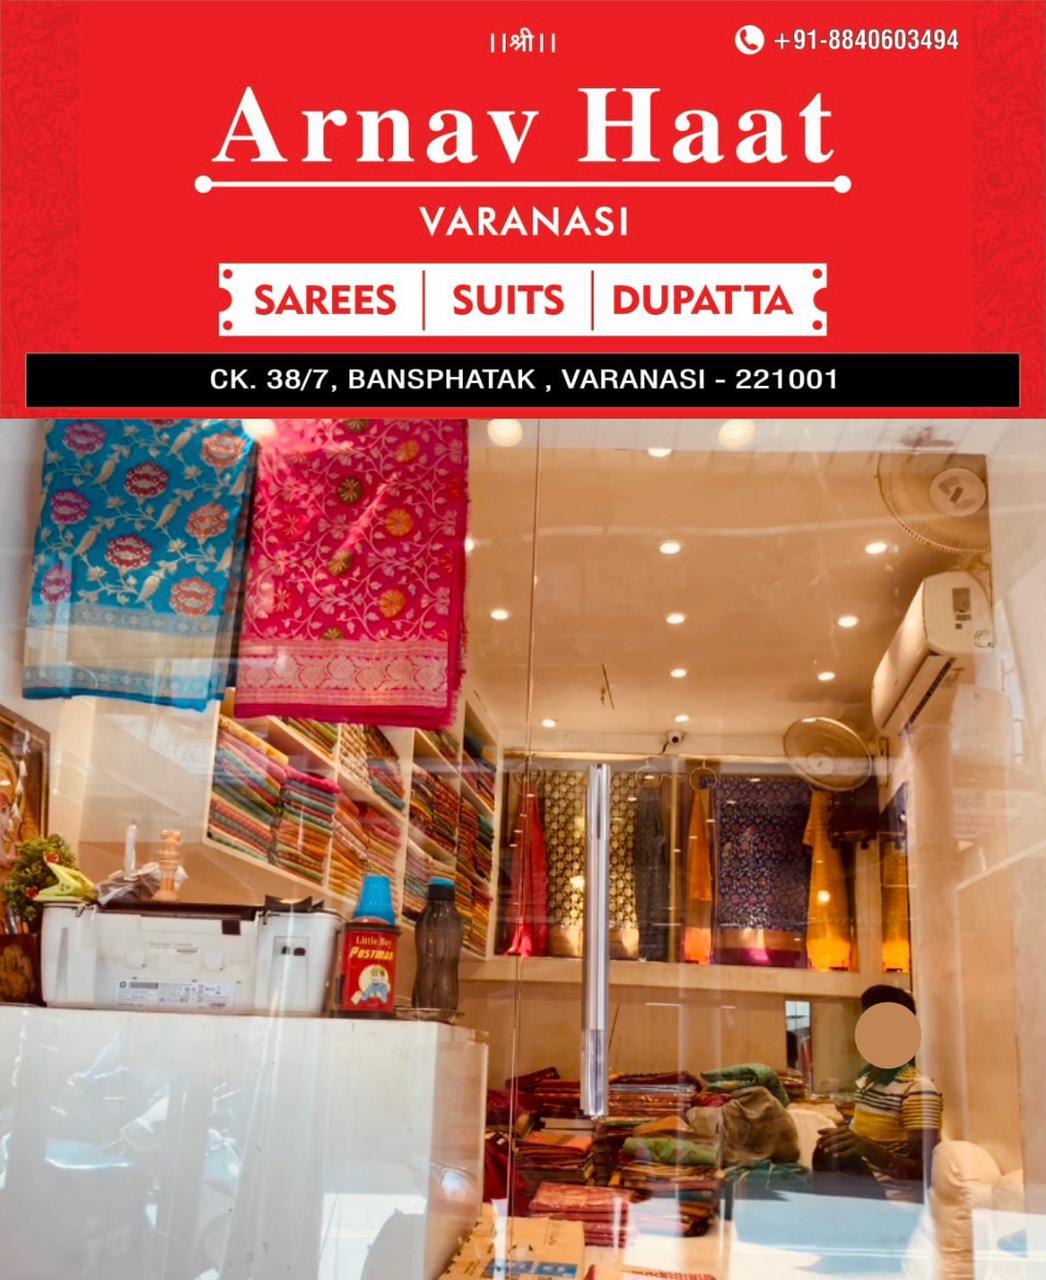 Arnav Haat Saree shop